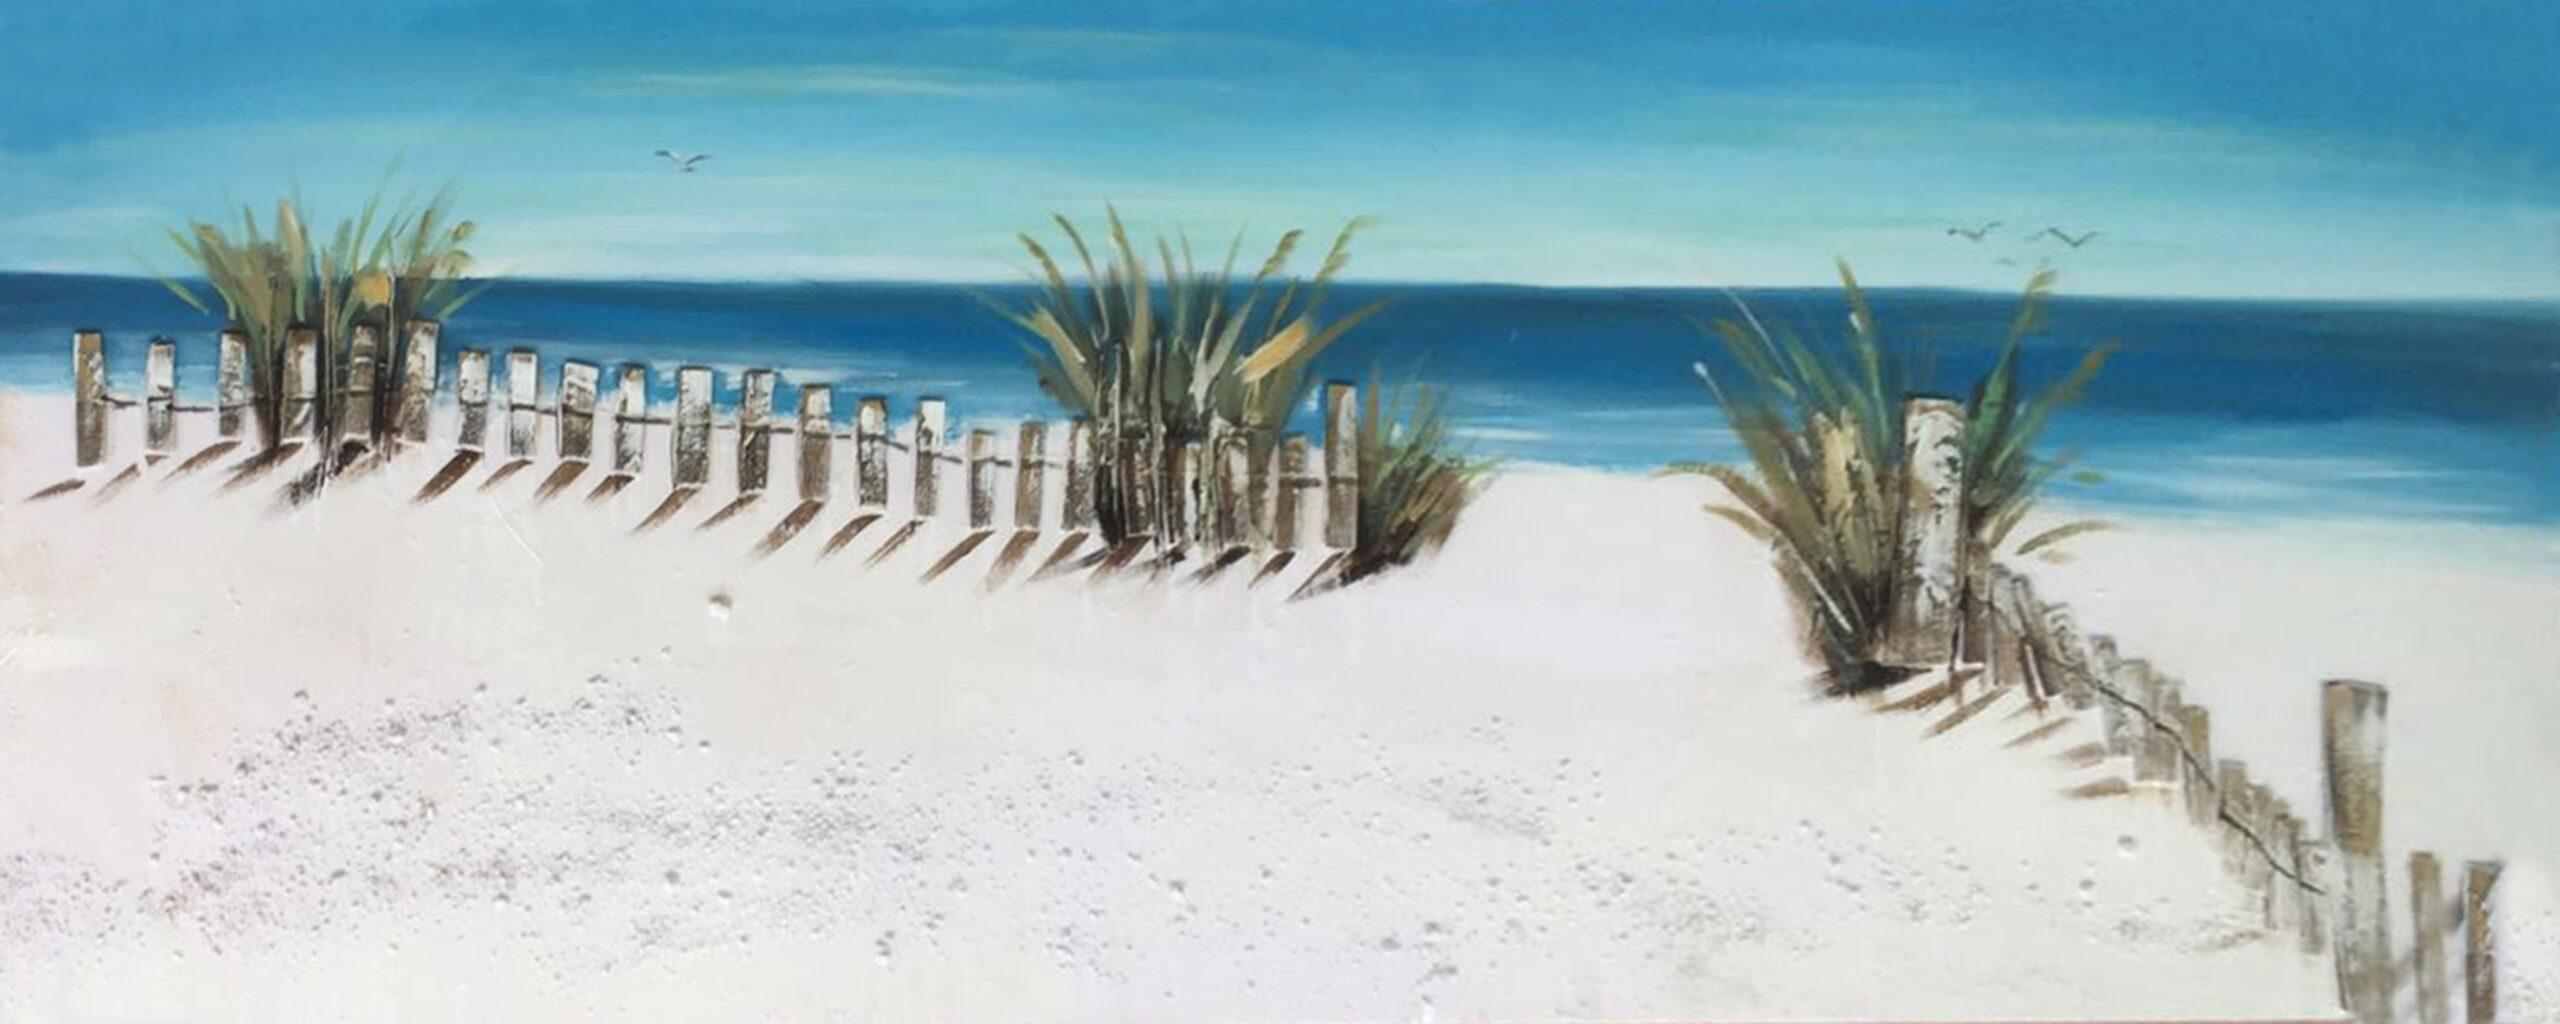 Schilderij Gateway to the Beach Strand Zee GS-P0544